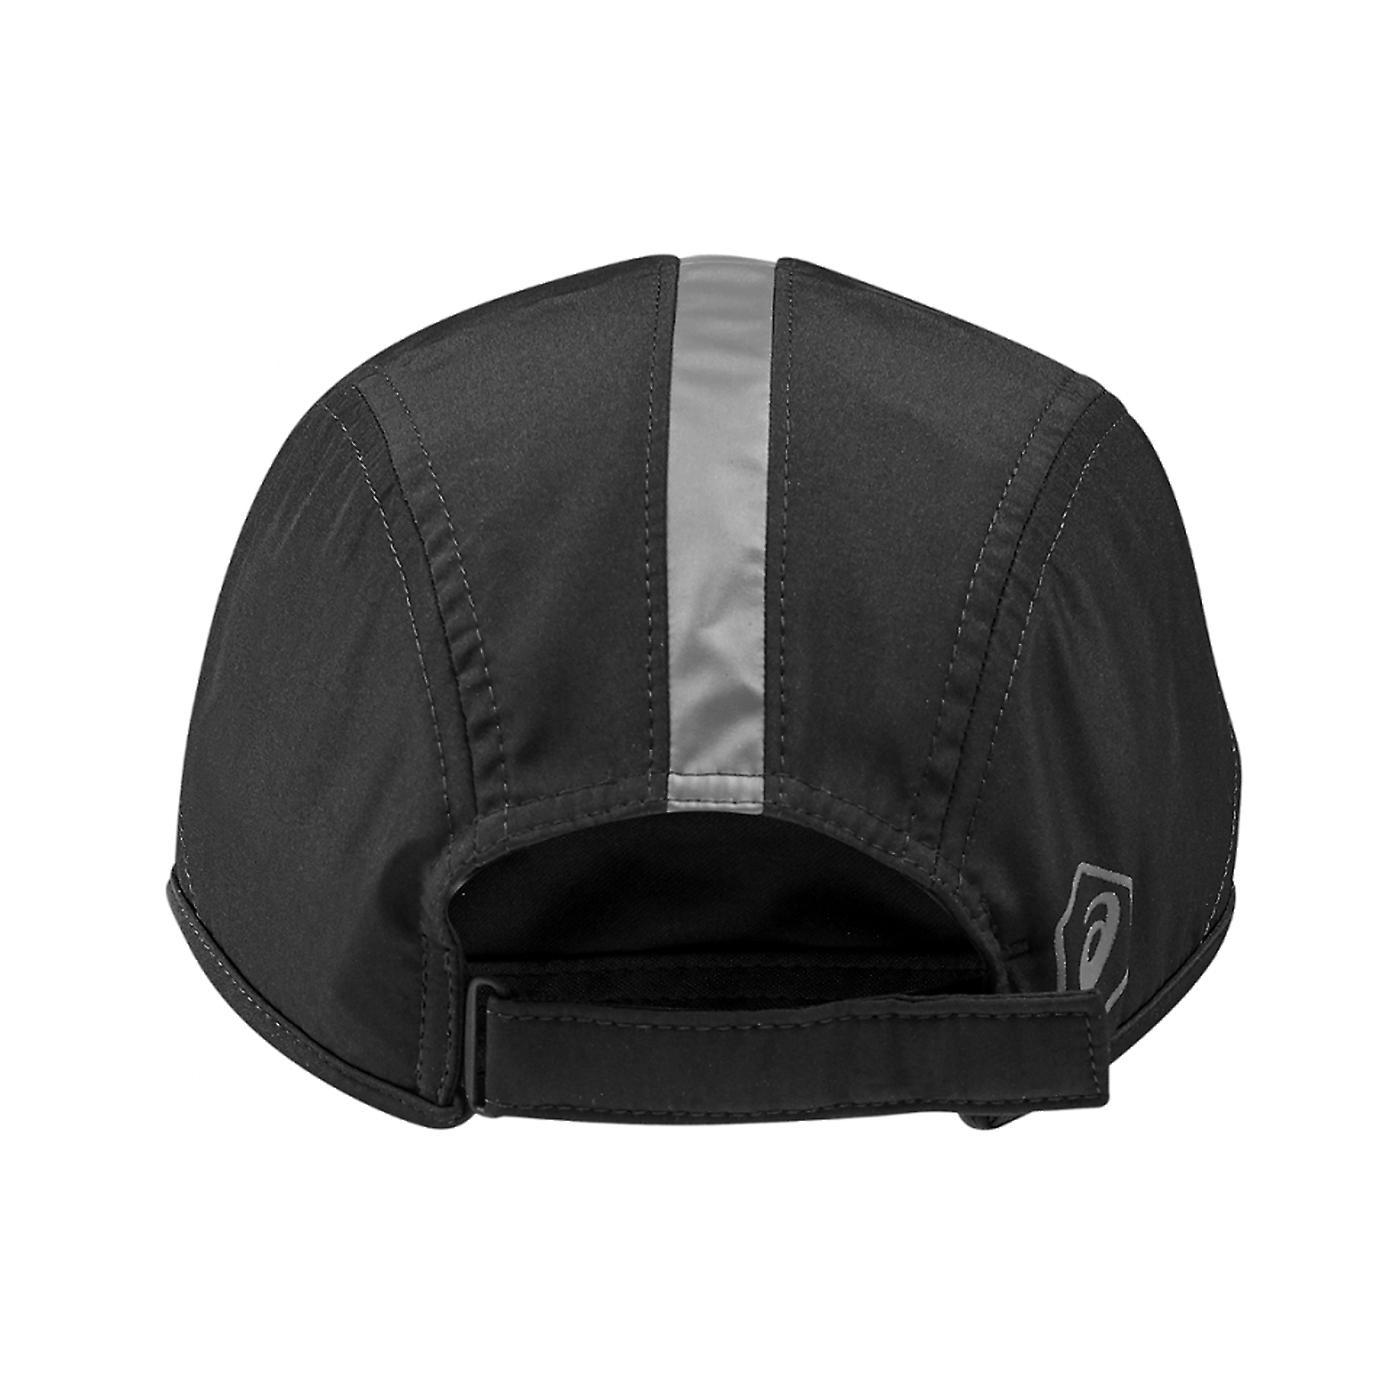 Asics Performance Running Exercise Fitness Training Cap Hat Black/Grey